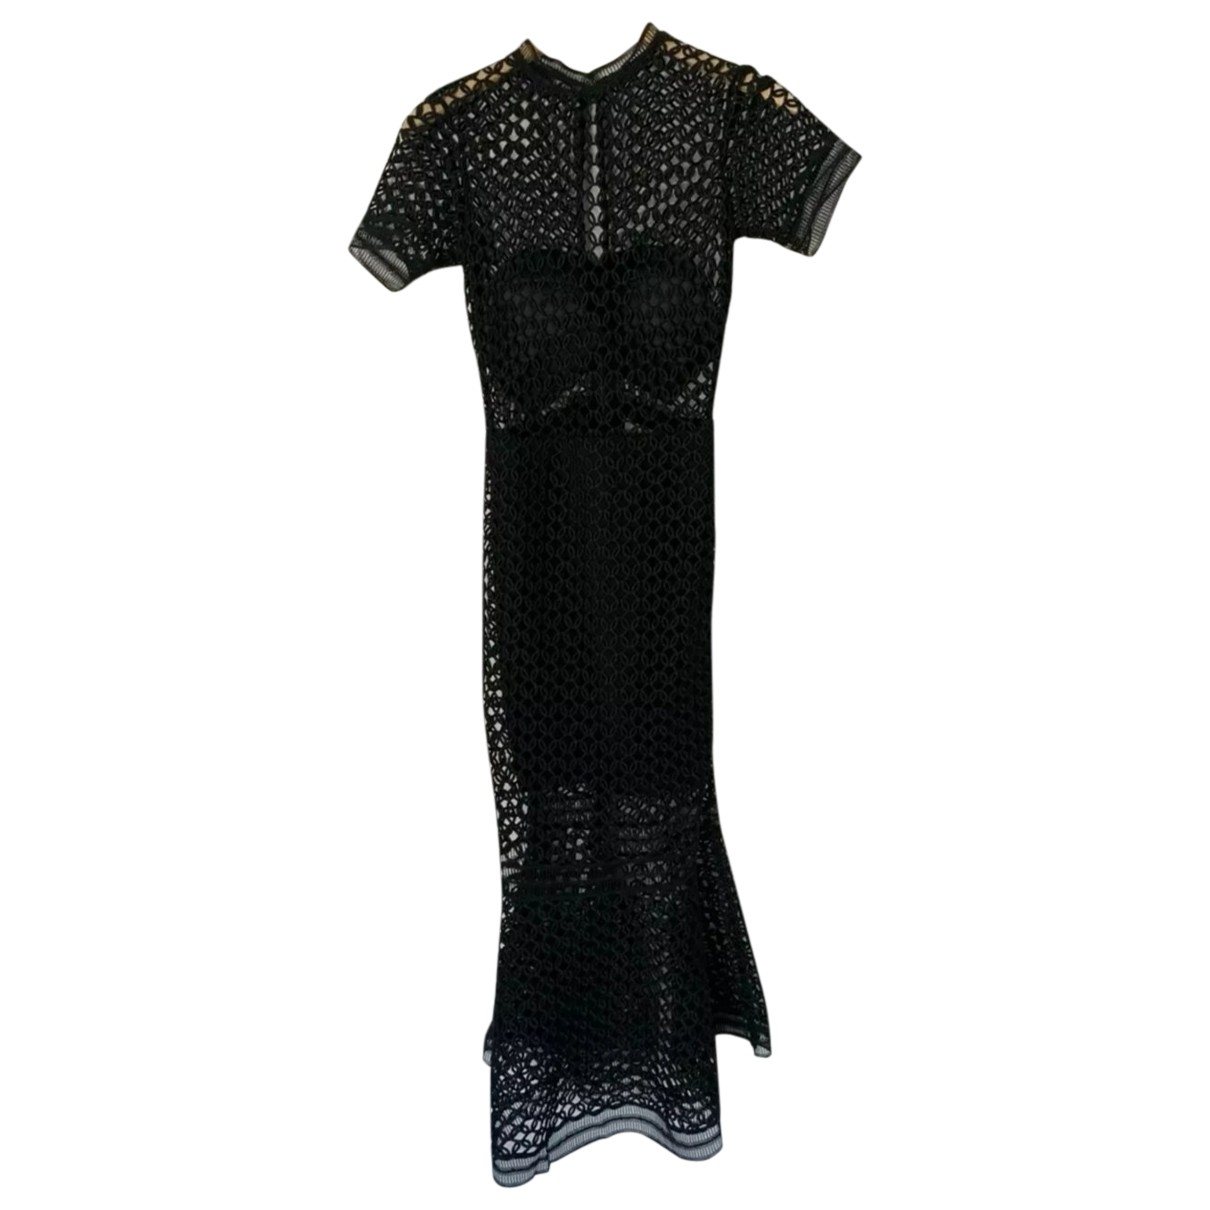 Self Portrait \N Black Cotton dress for Women 8 UK